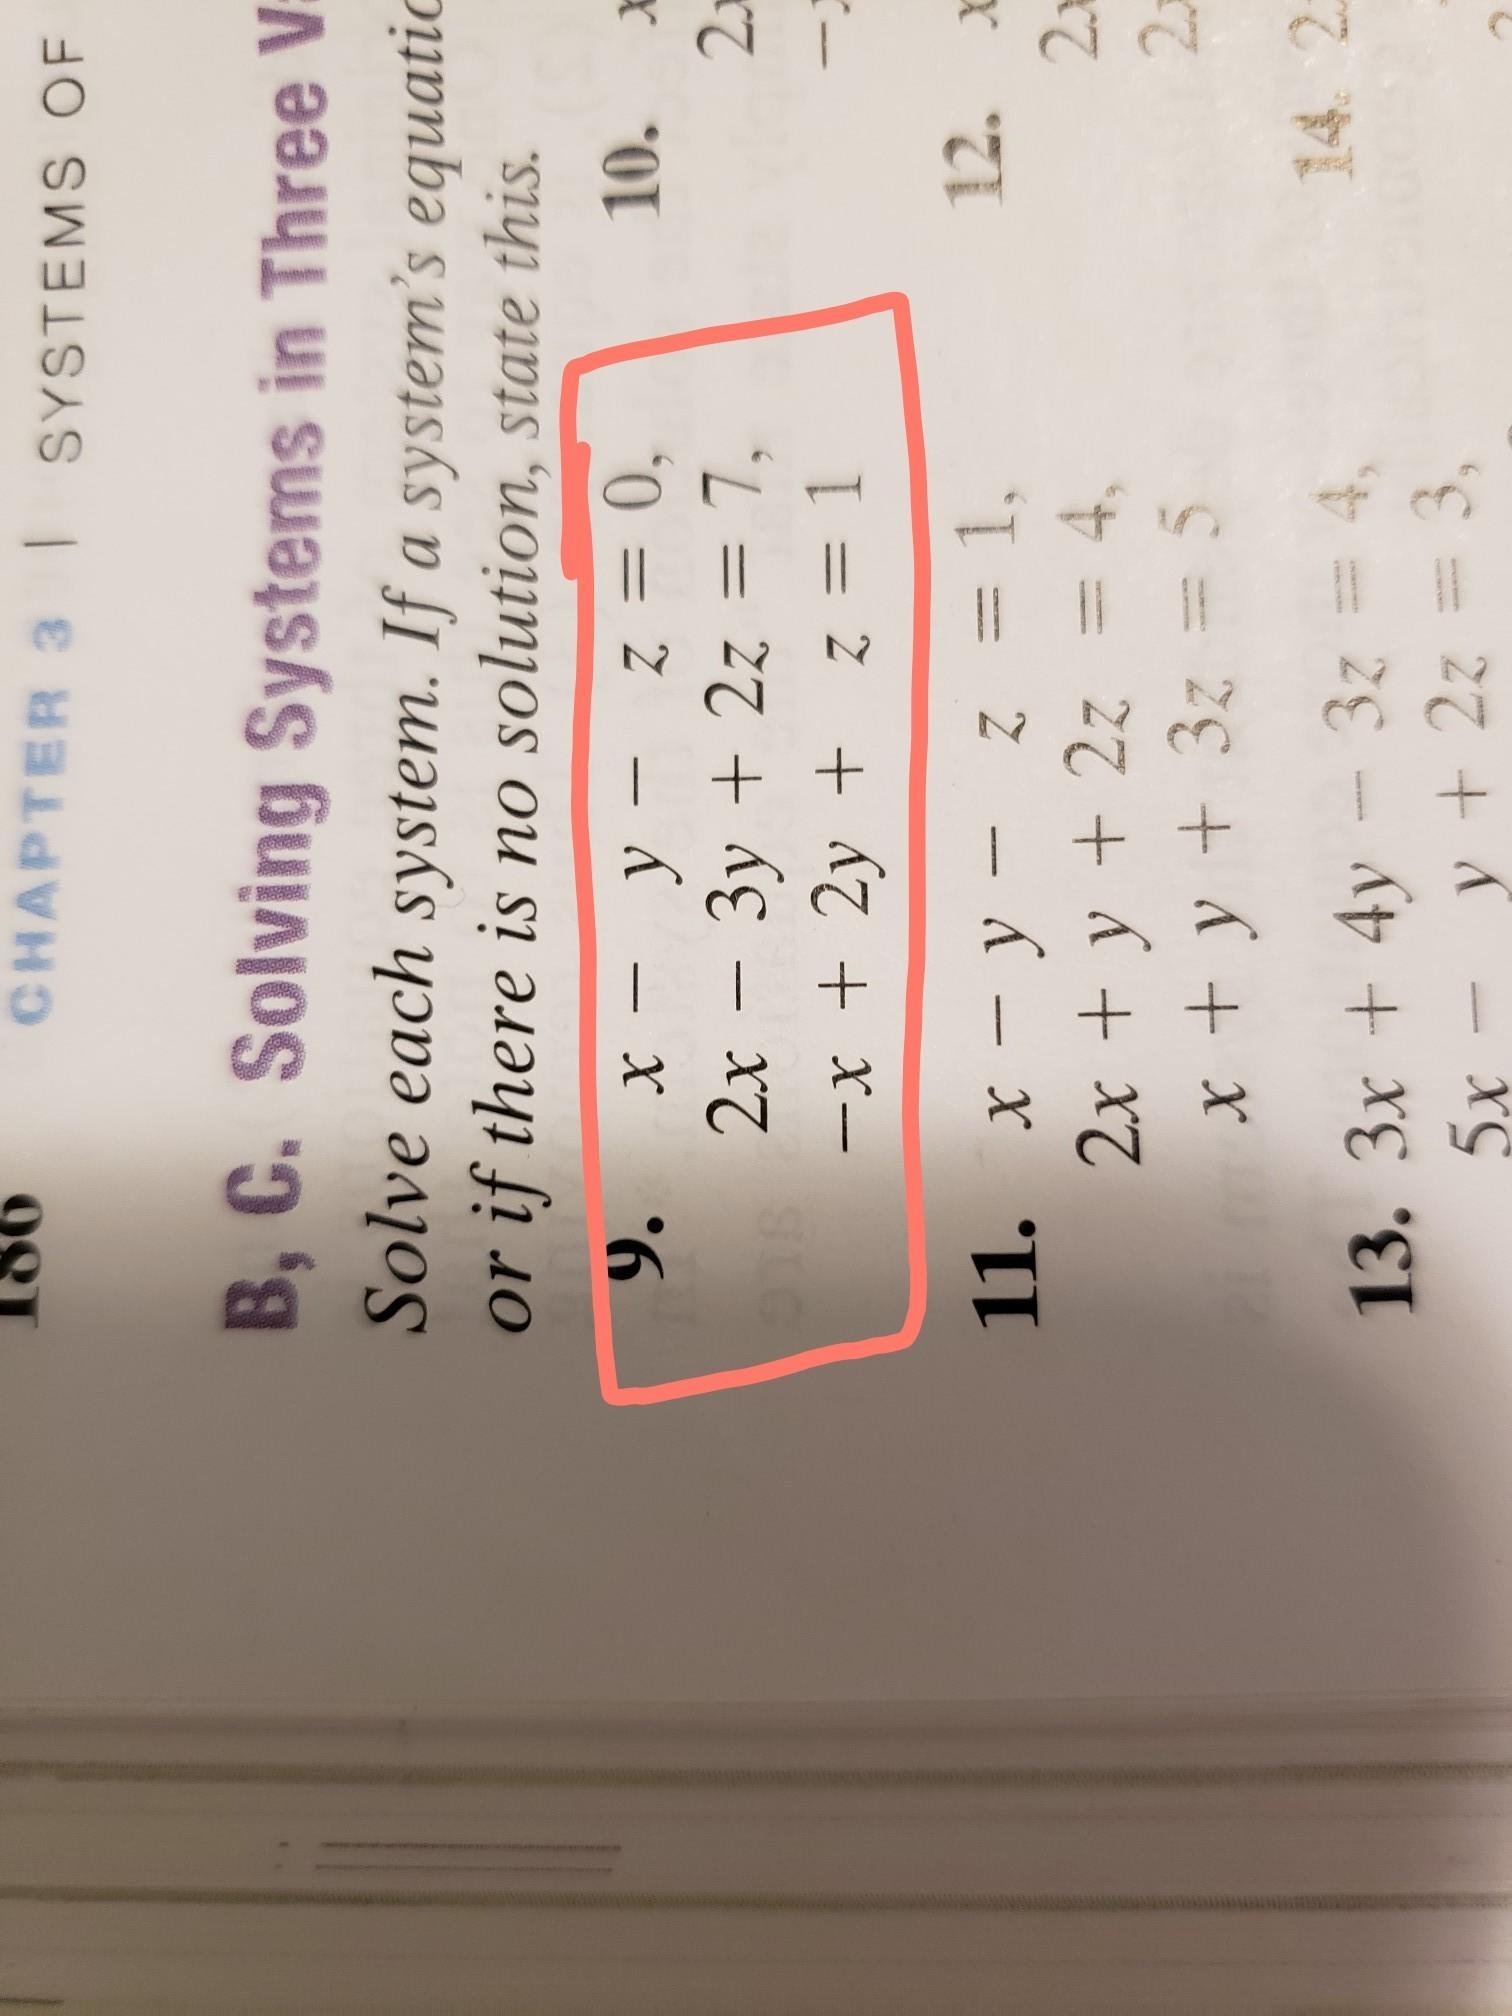 3x4y 3z45x Y2z3x2y Z 2 Solving Systems In Three Variables